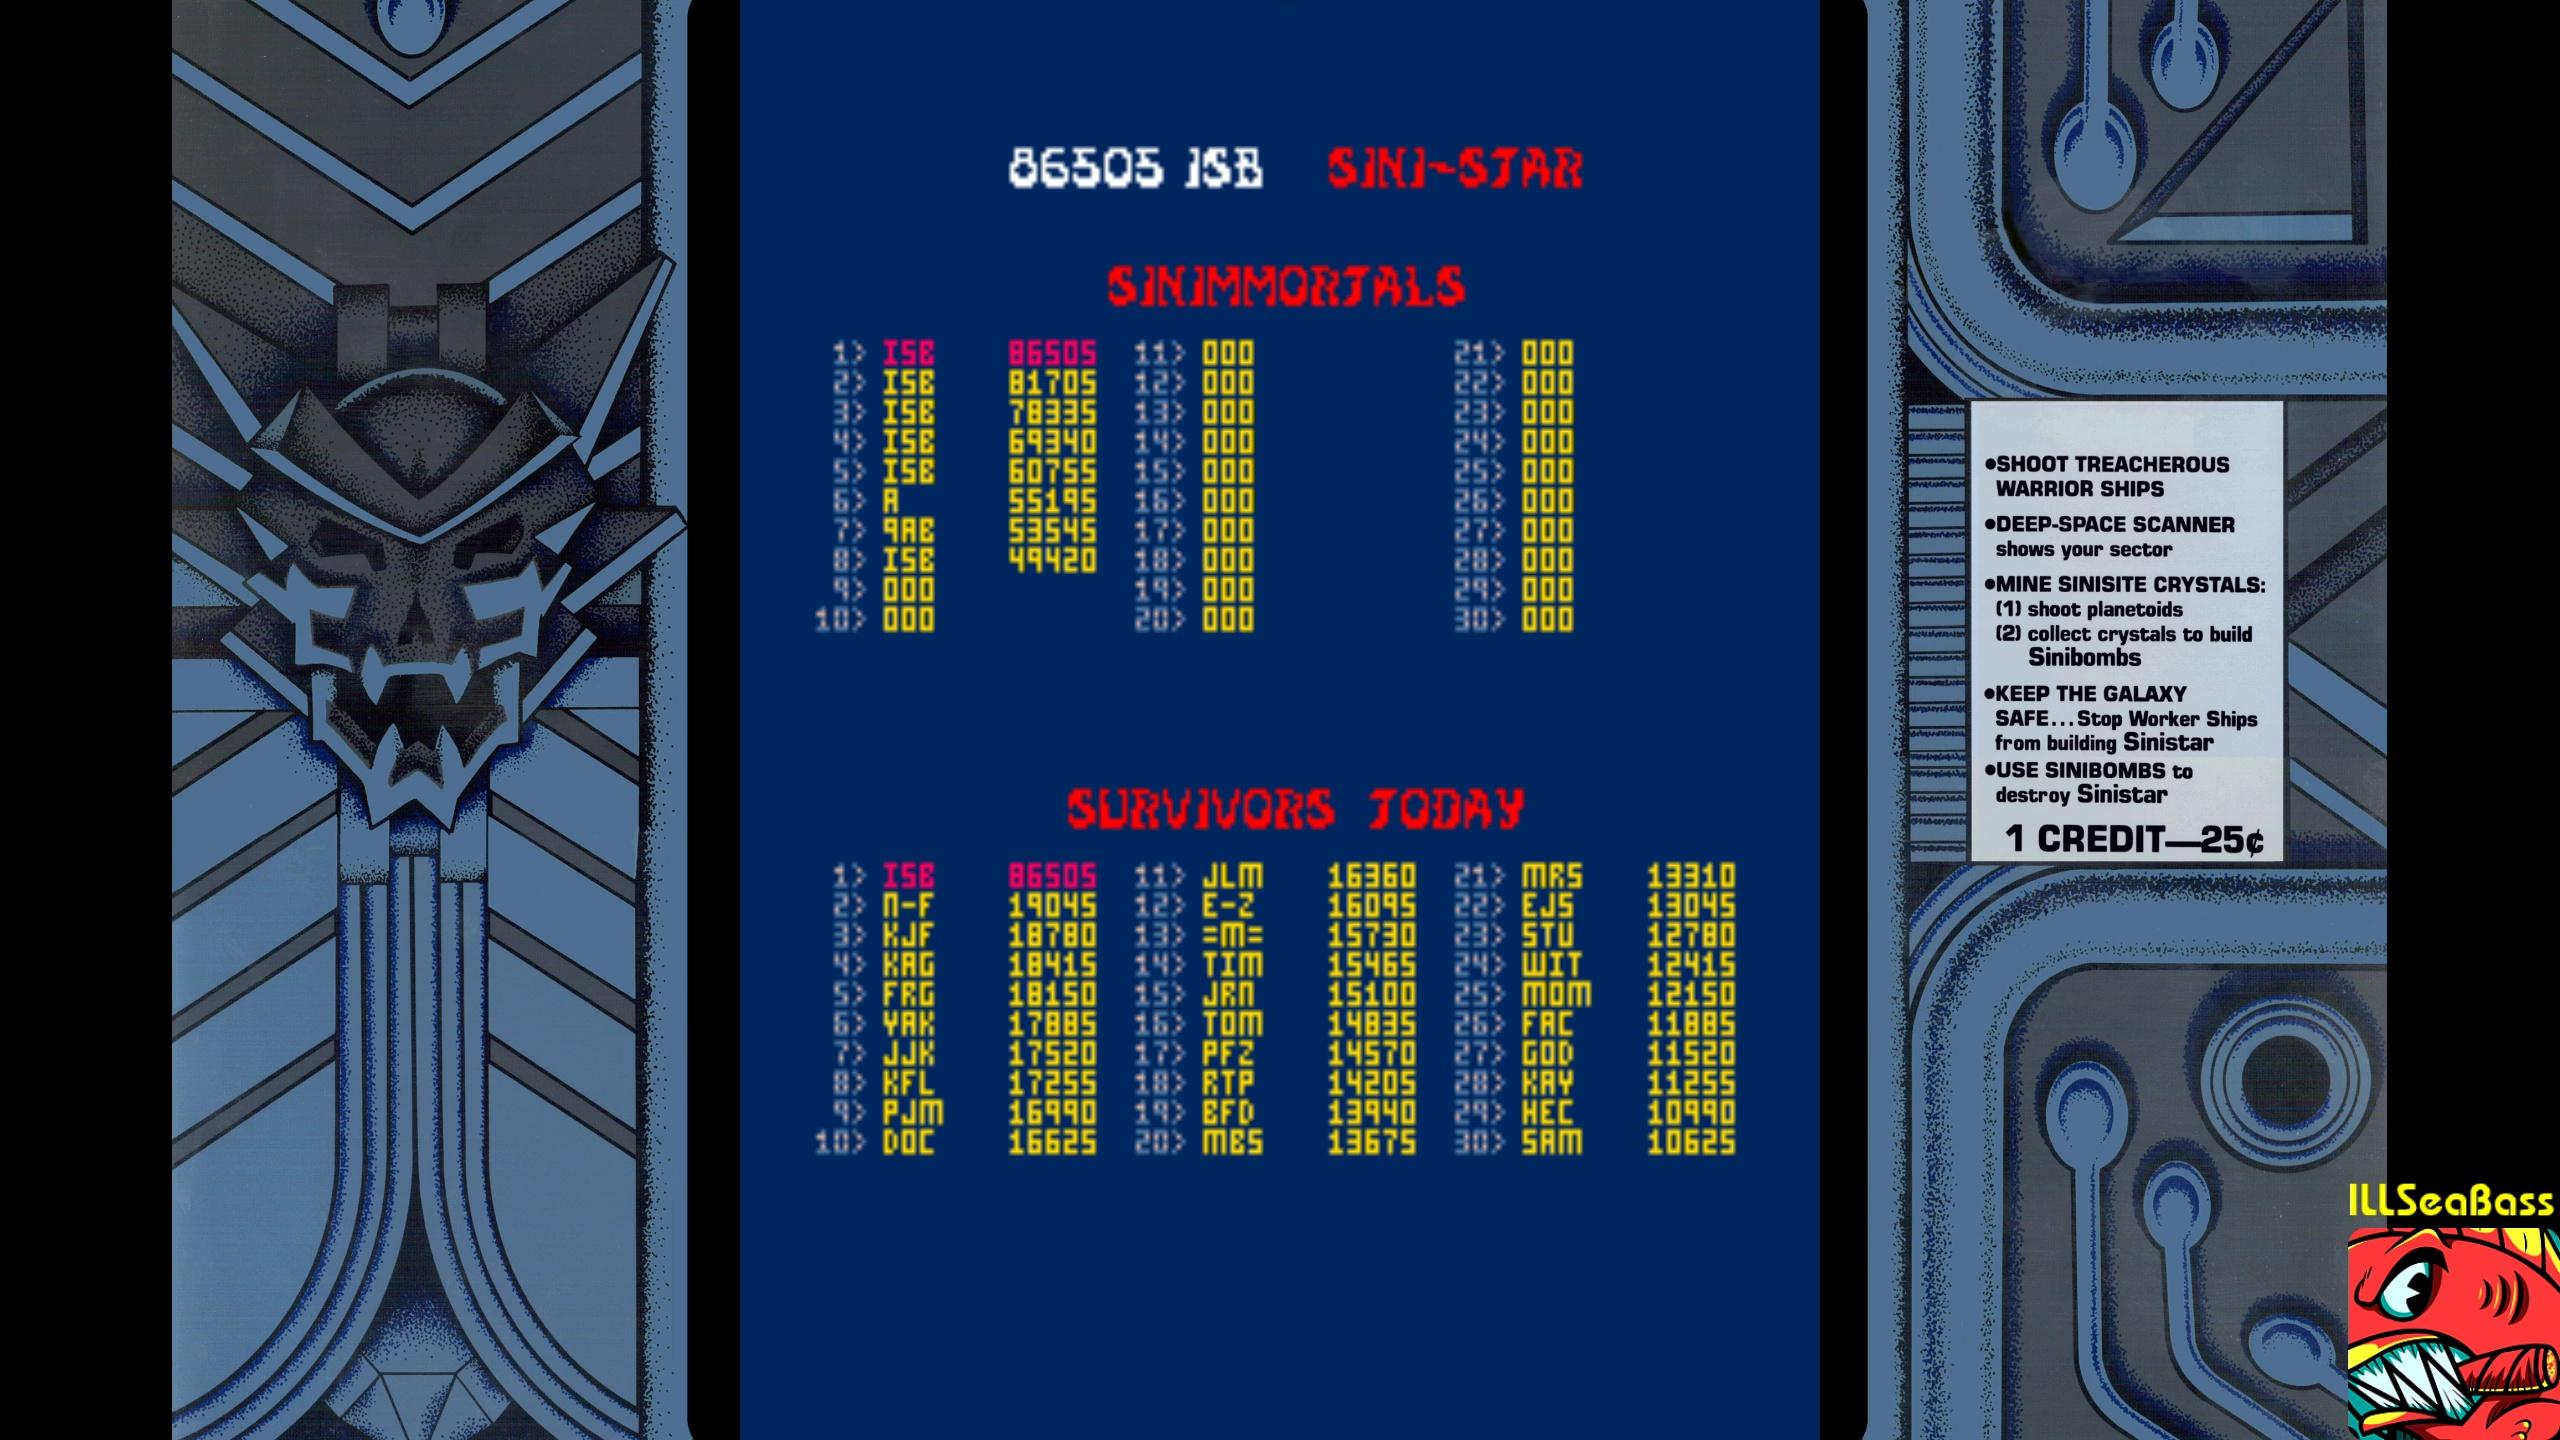 ILLSeaBass: Sinistar (Arcade Emulated / M.A.M.E.) 86,505 points on 2018-02-07 23:35:01